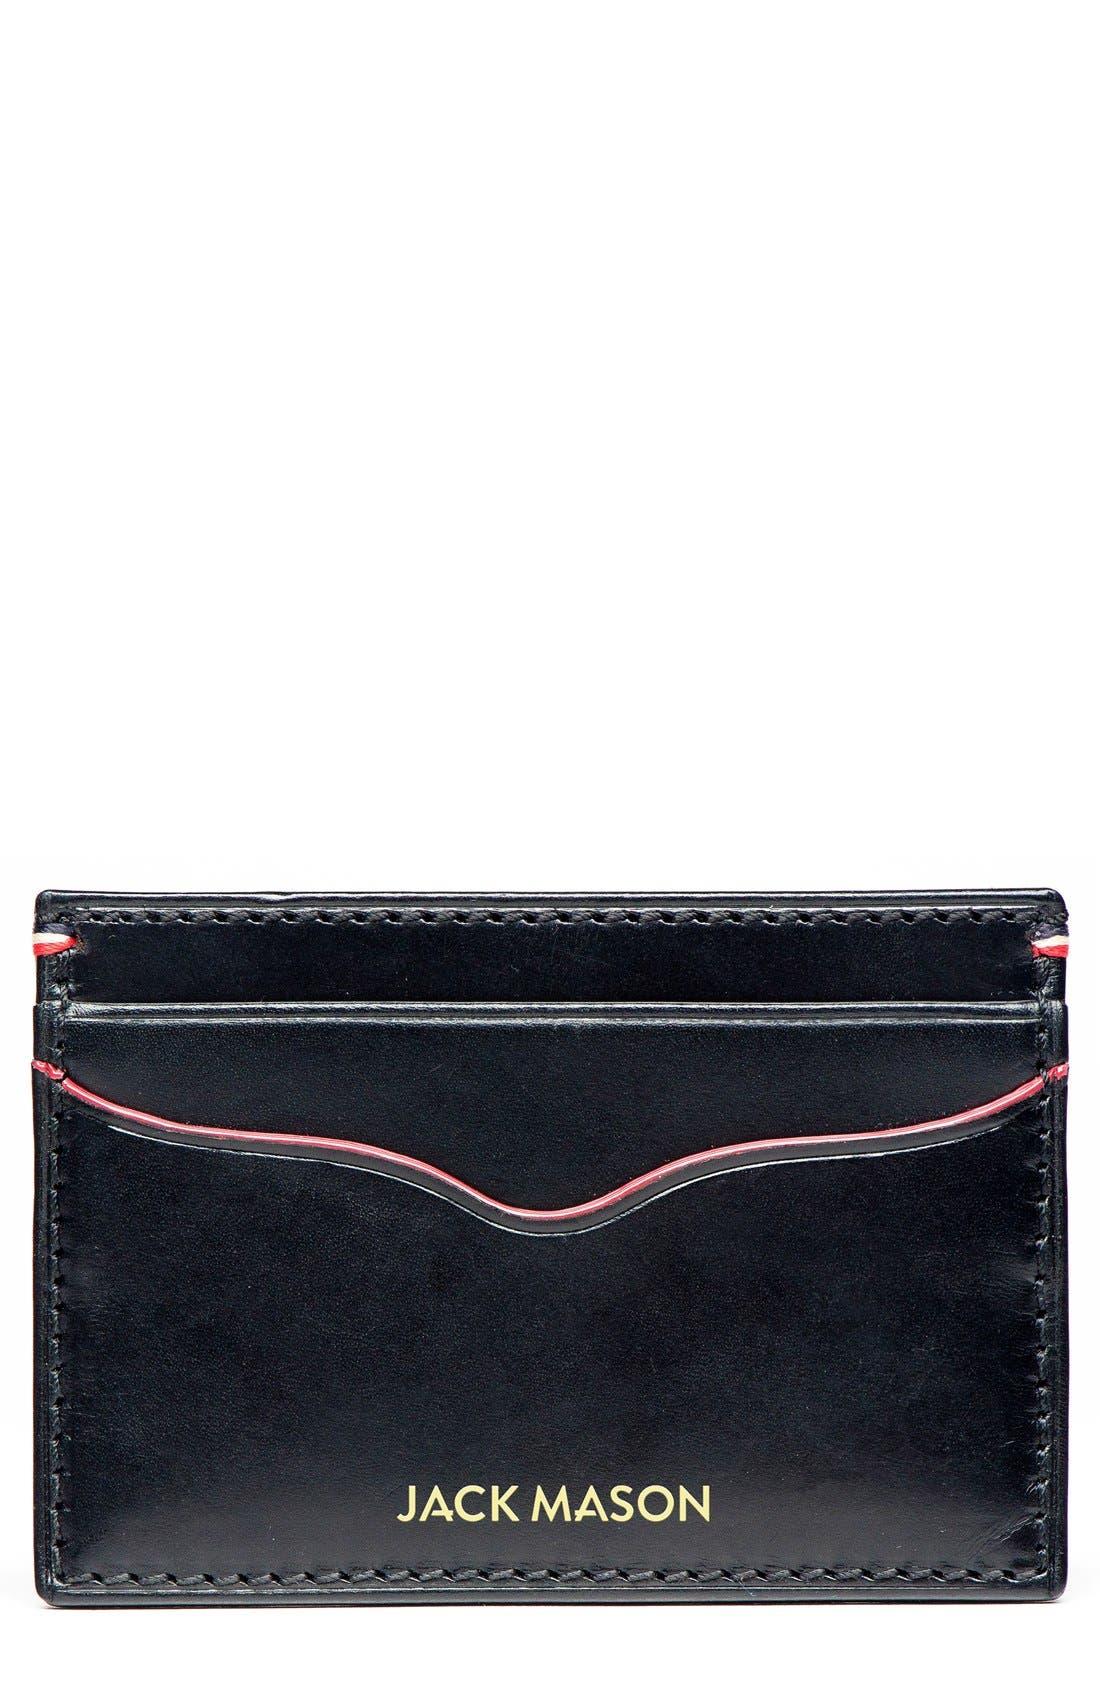 Alternate Image 1 Selected - Jack Mason Vacchetta Lux Leather Card Case